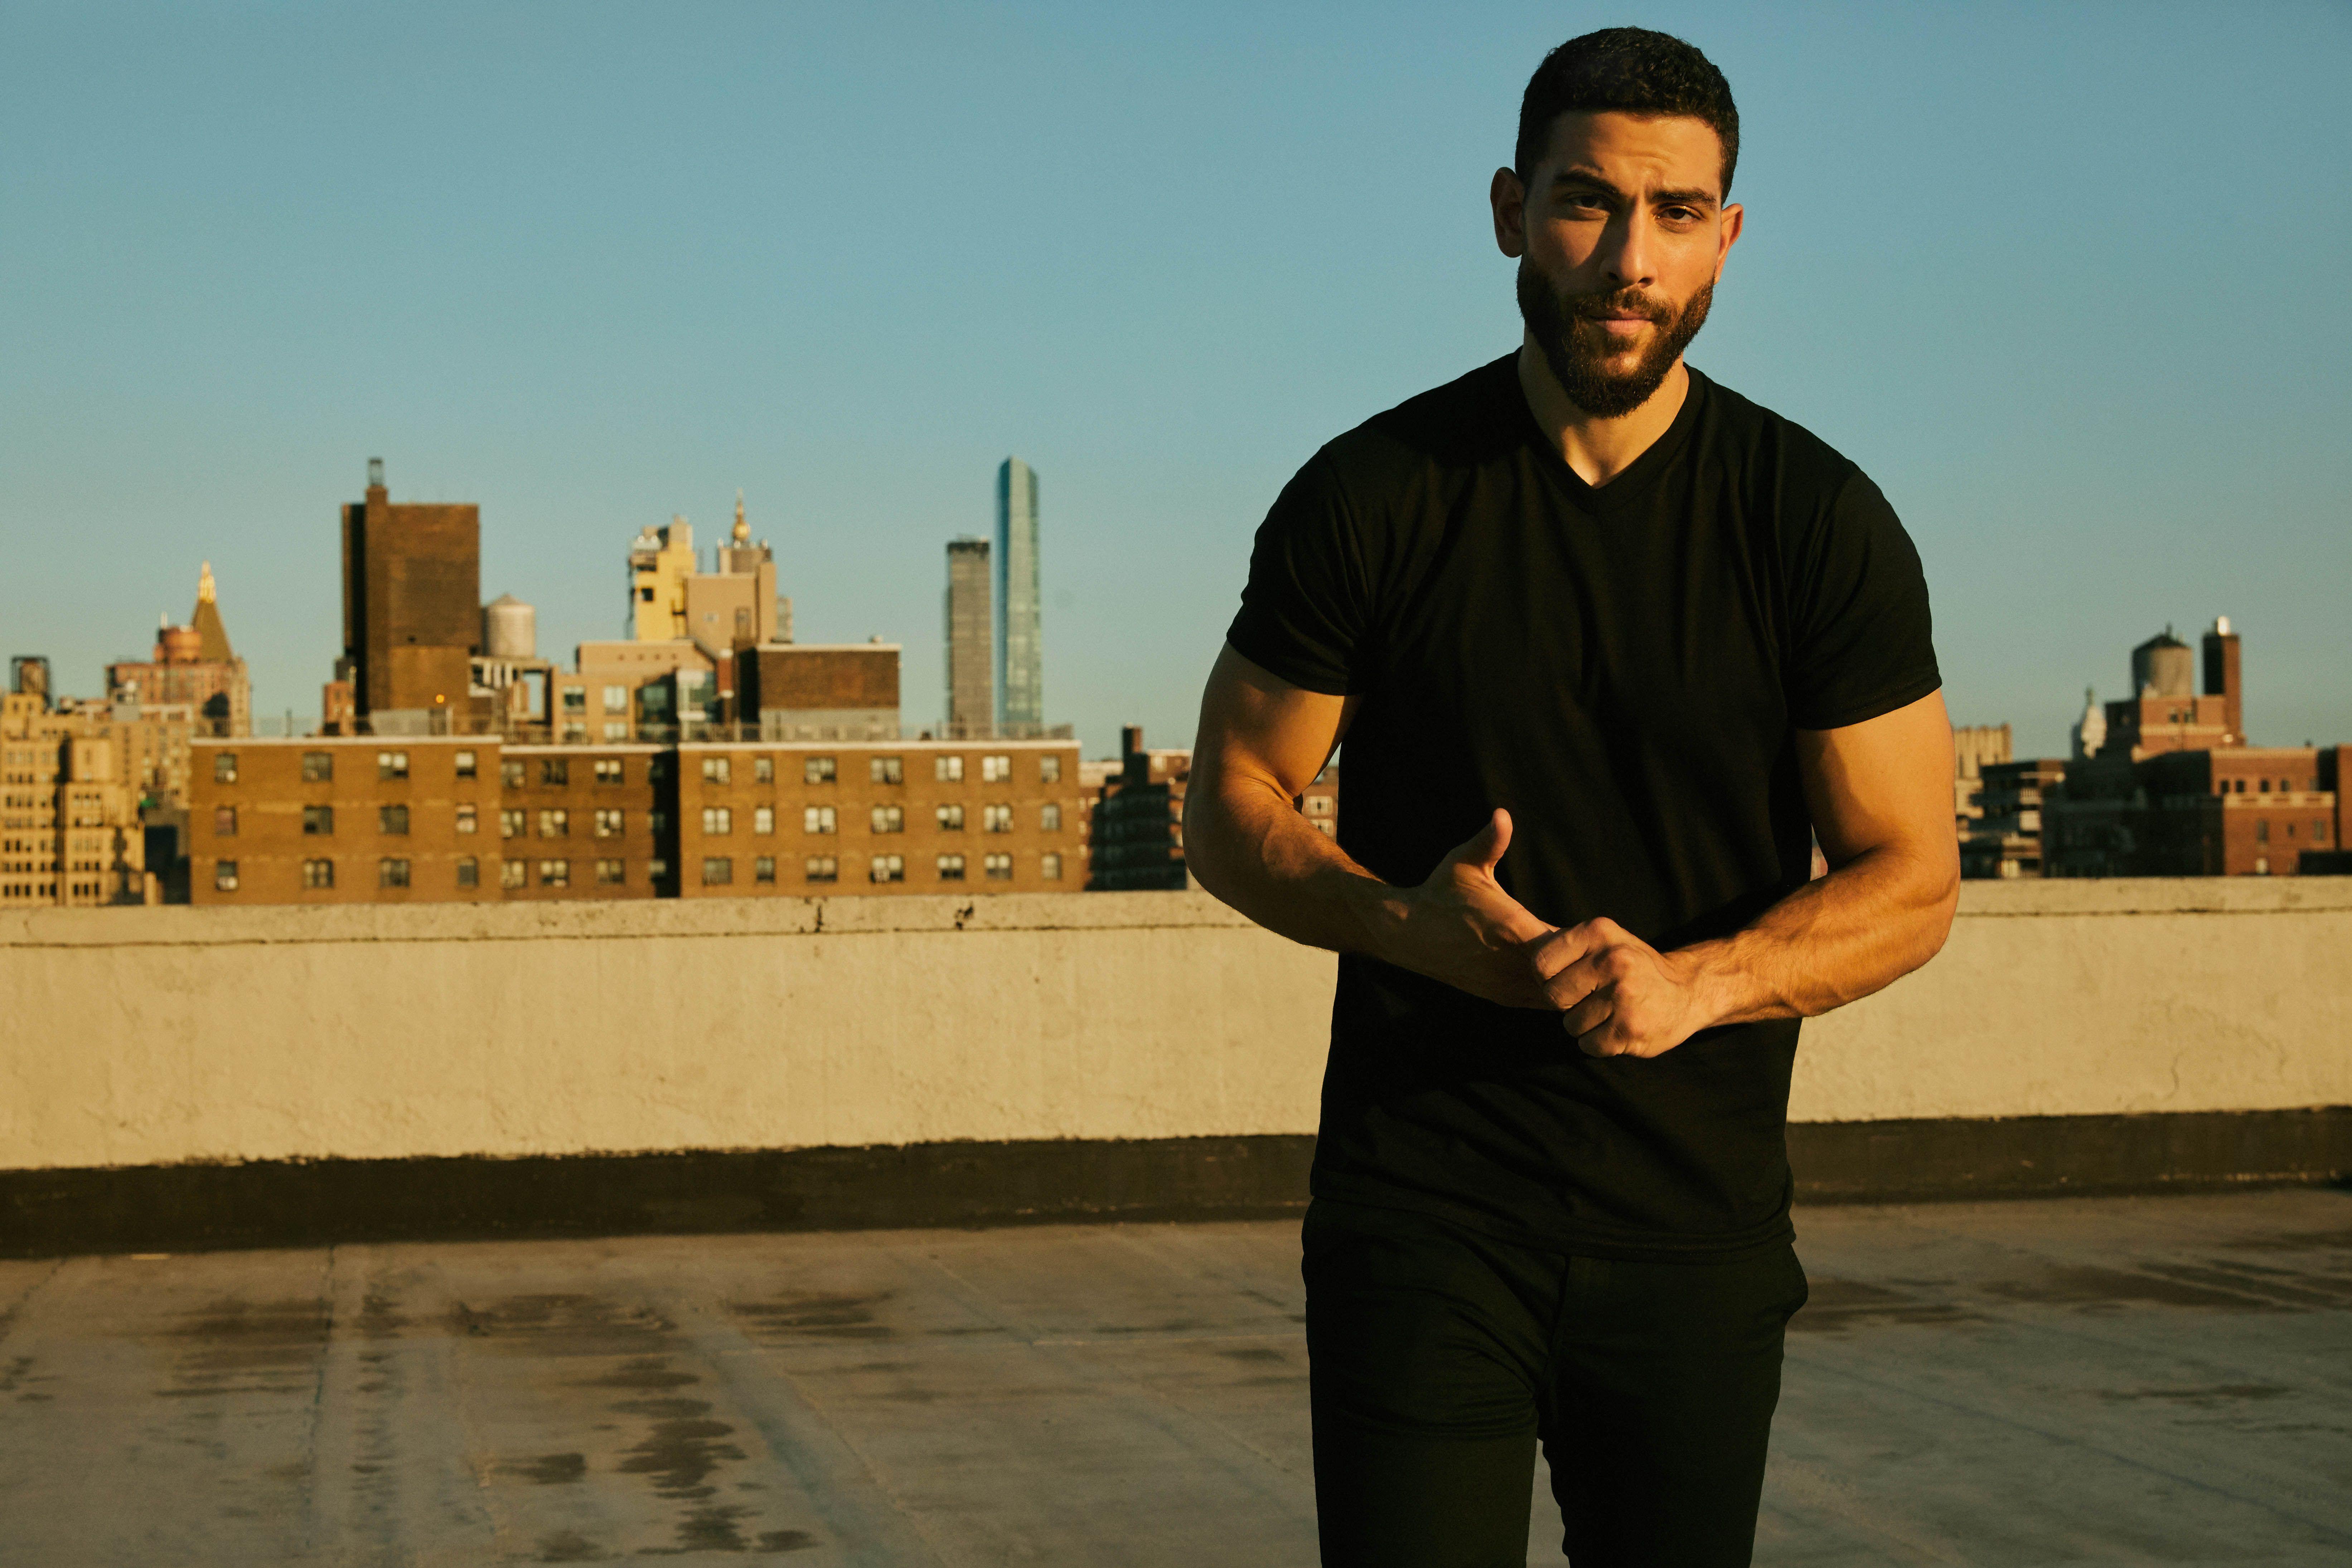 Actor Zeeko Zaki Interview About New Show FBI and Being an